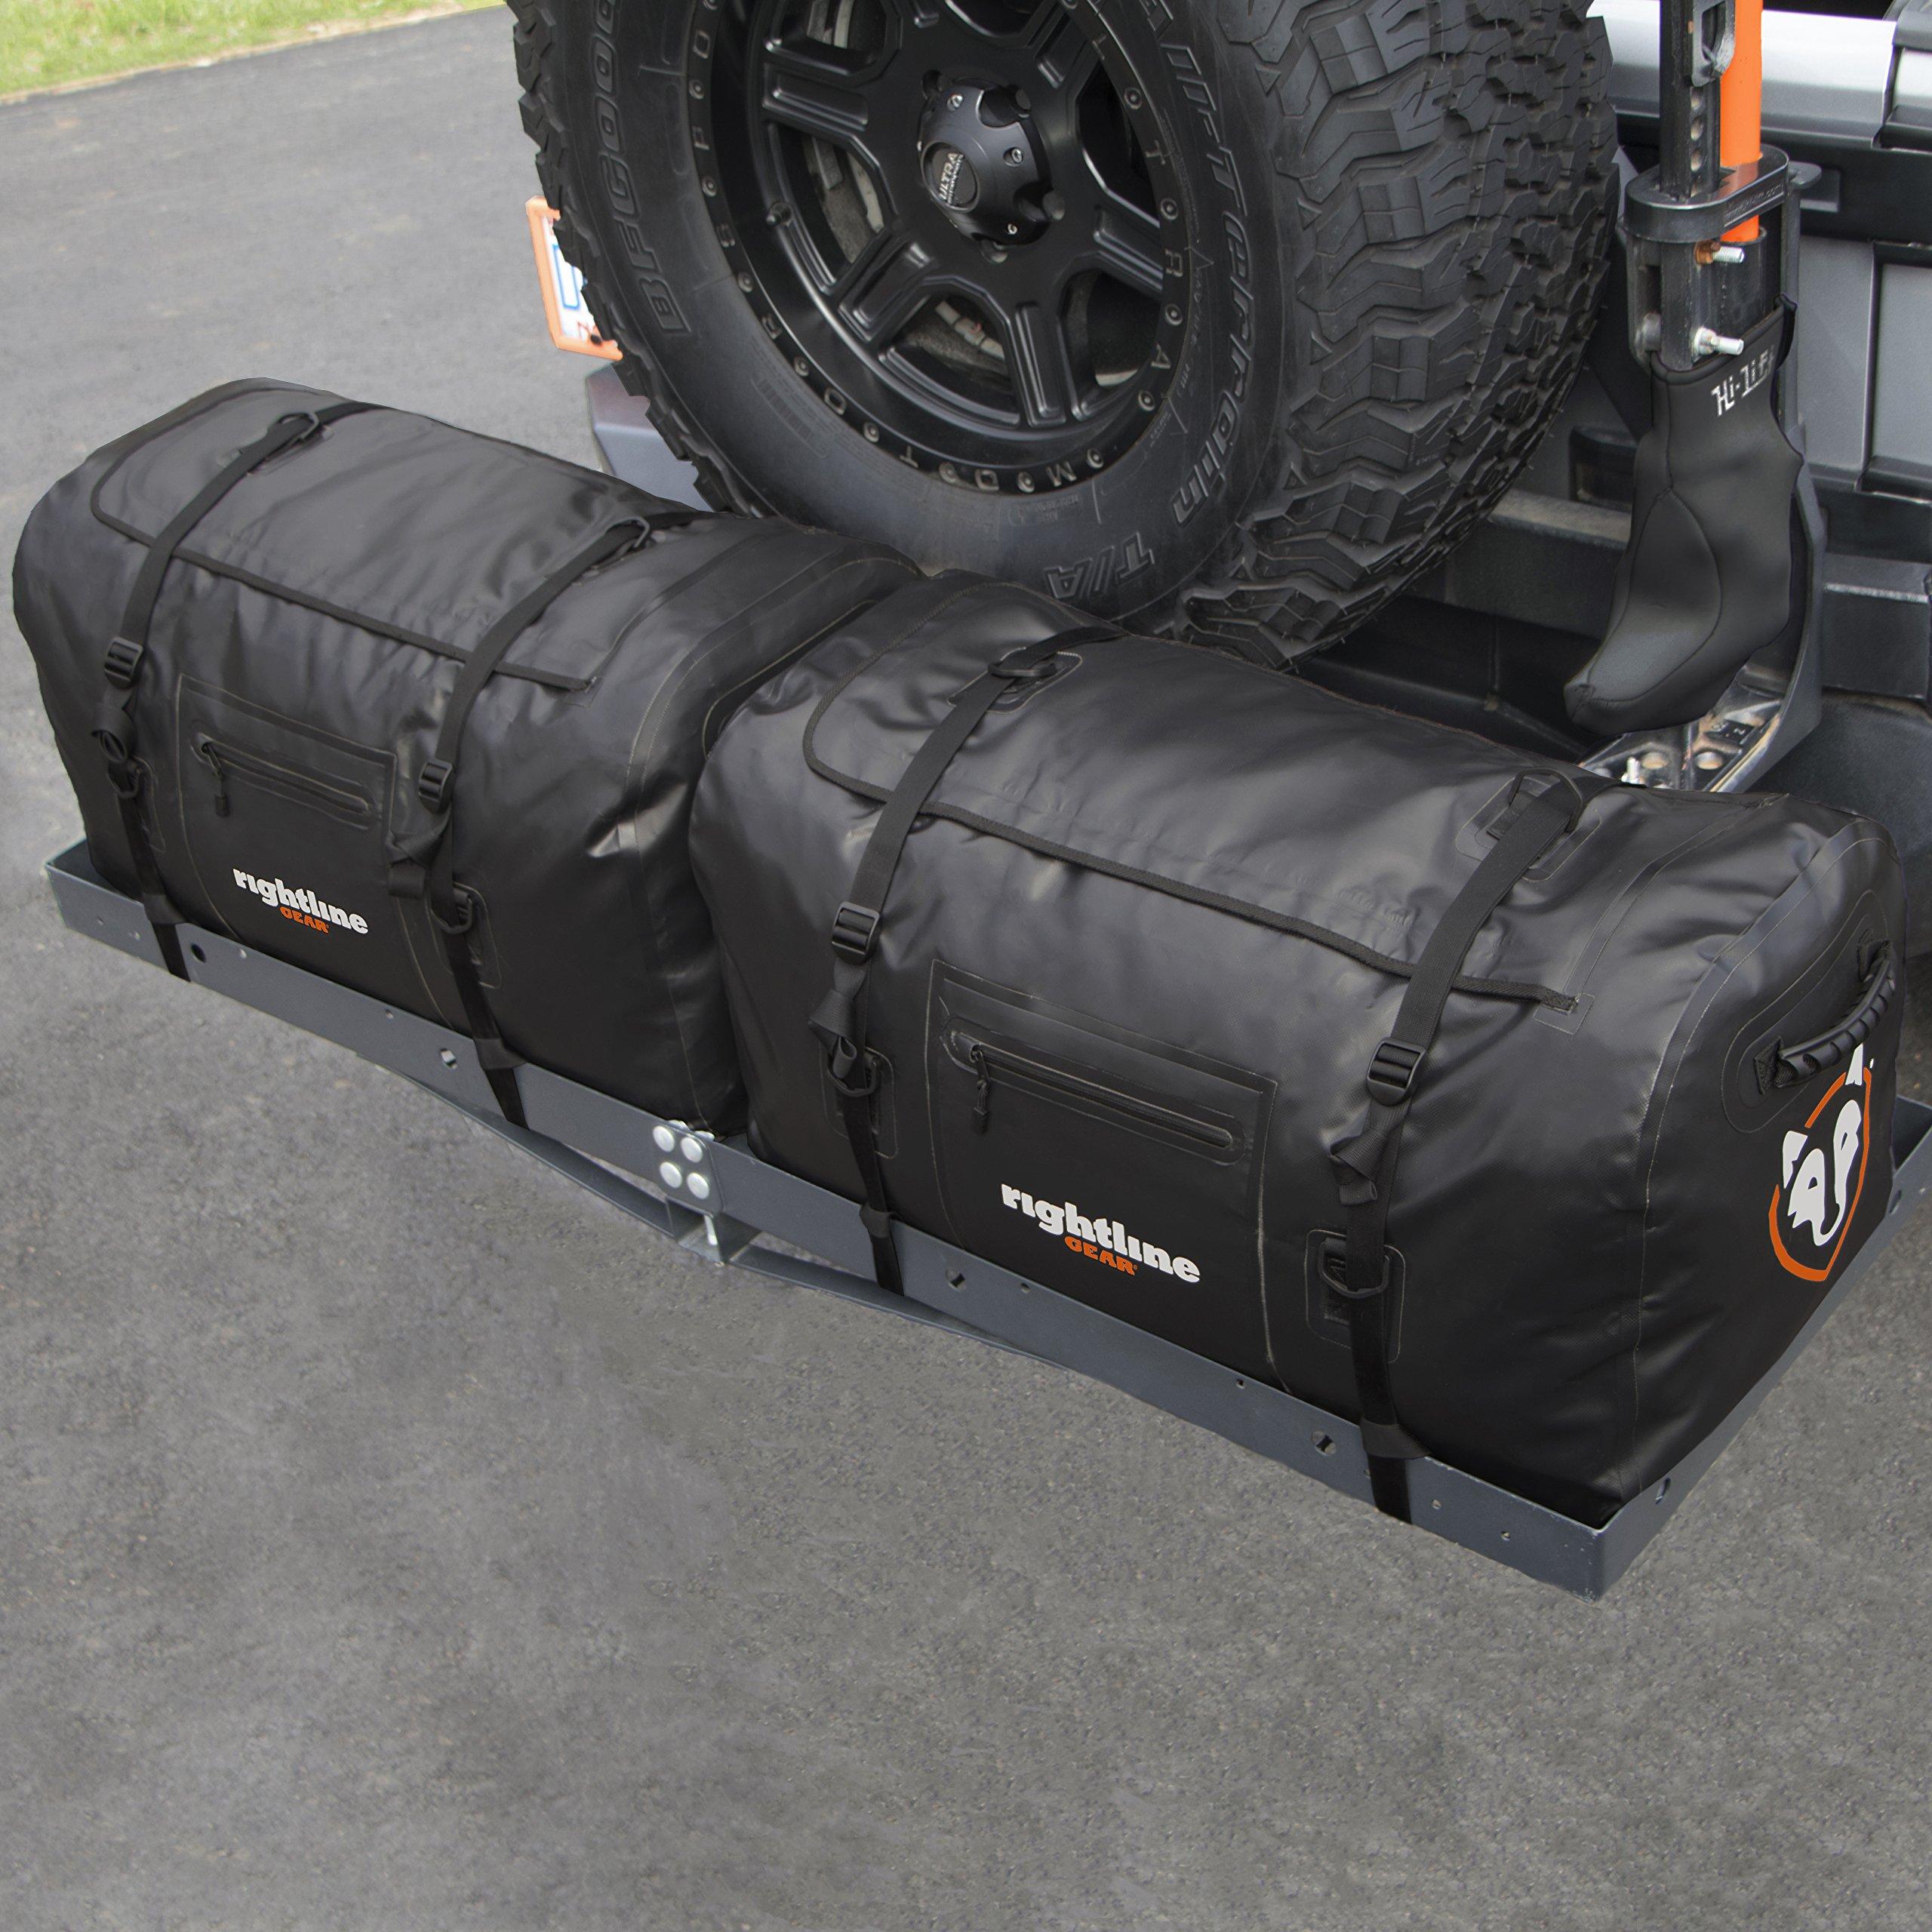 Rightline Gear 100J87-B 4x4 Duffle Bag (120L) by Rightline Gear (Image #5)